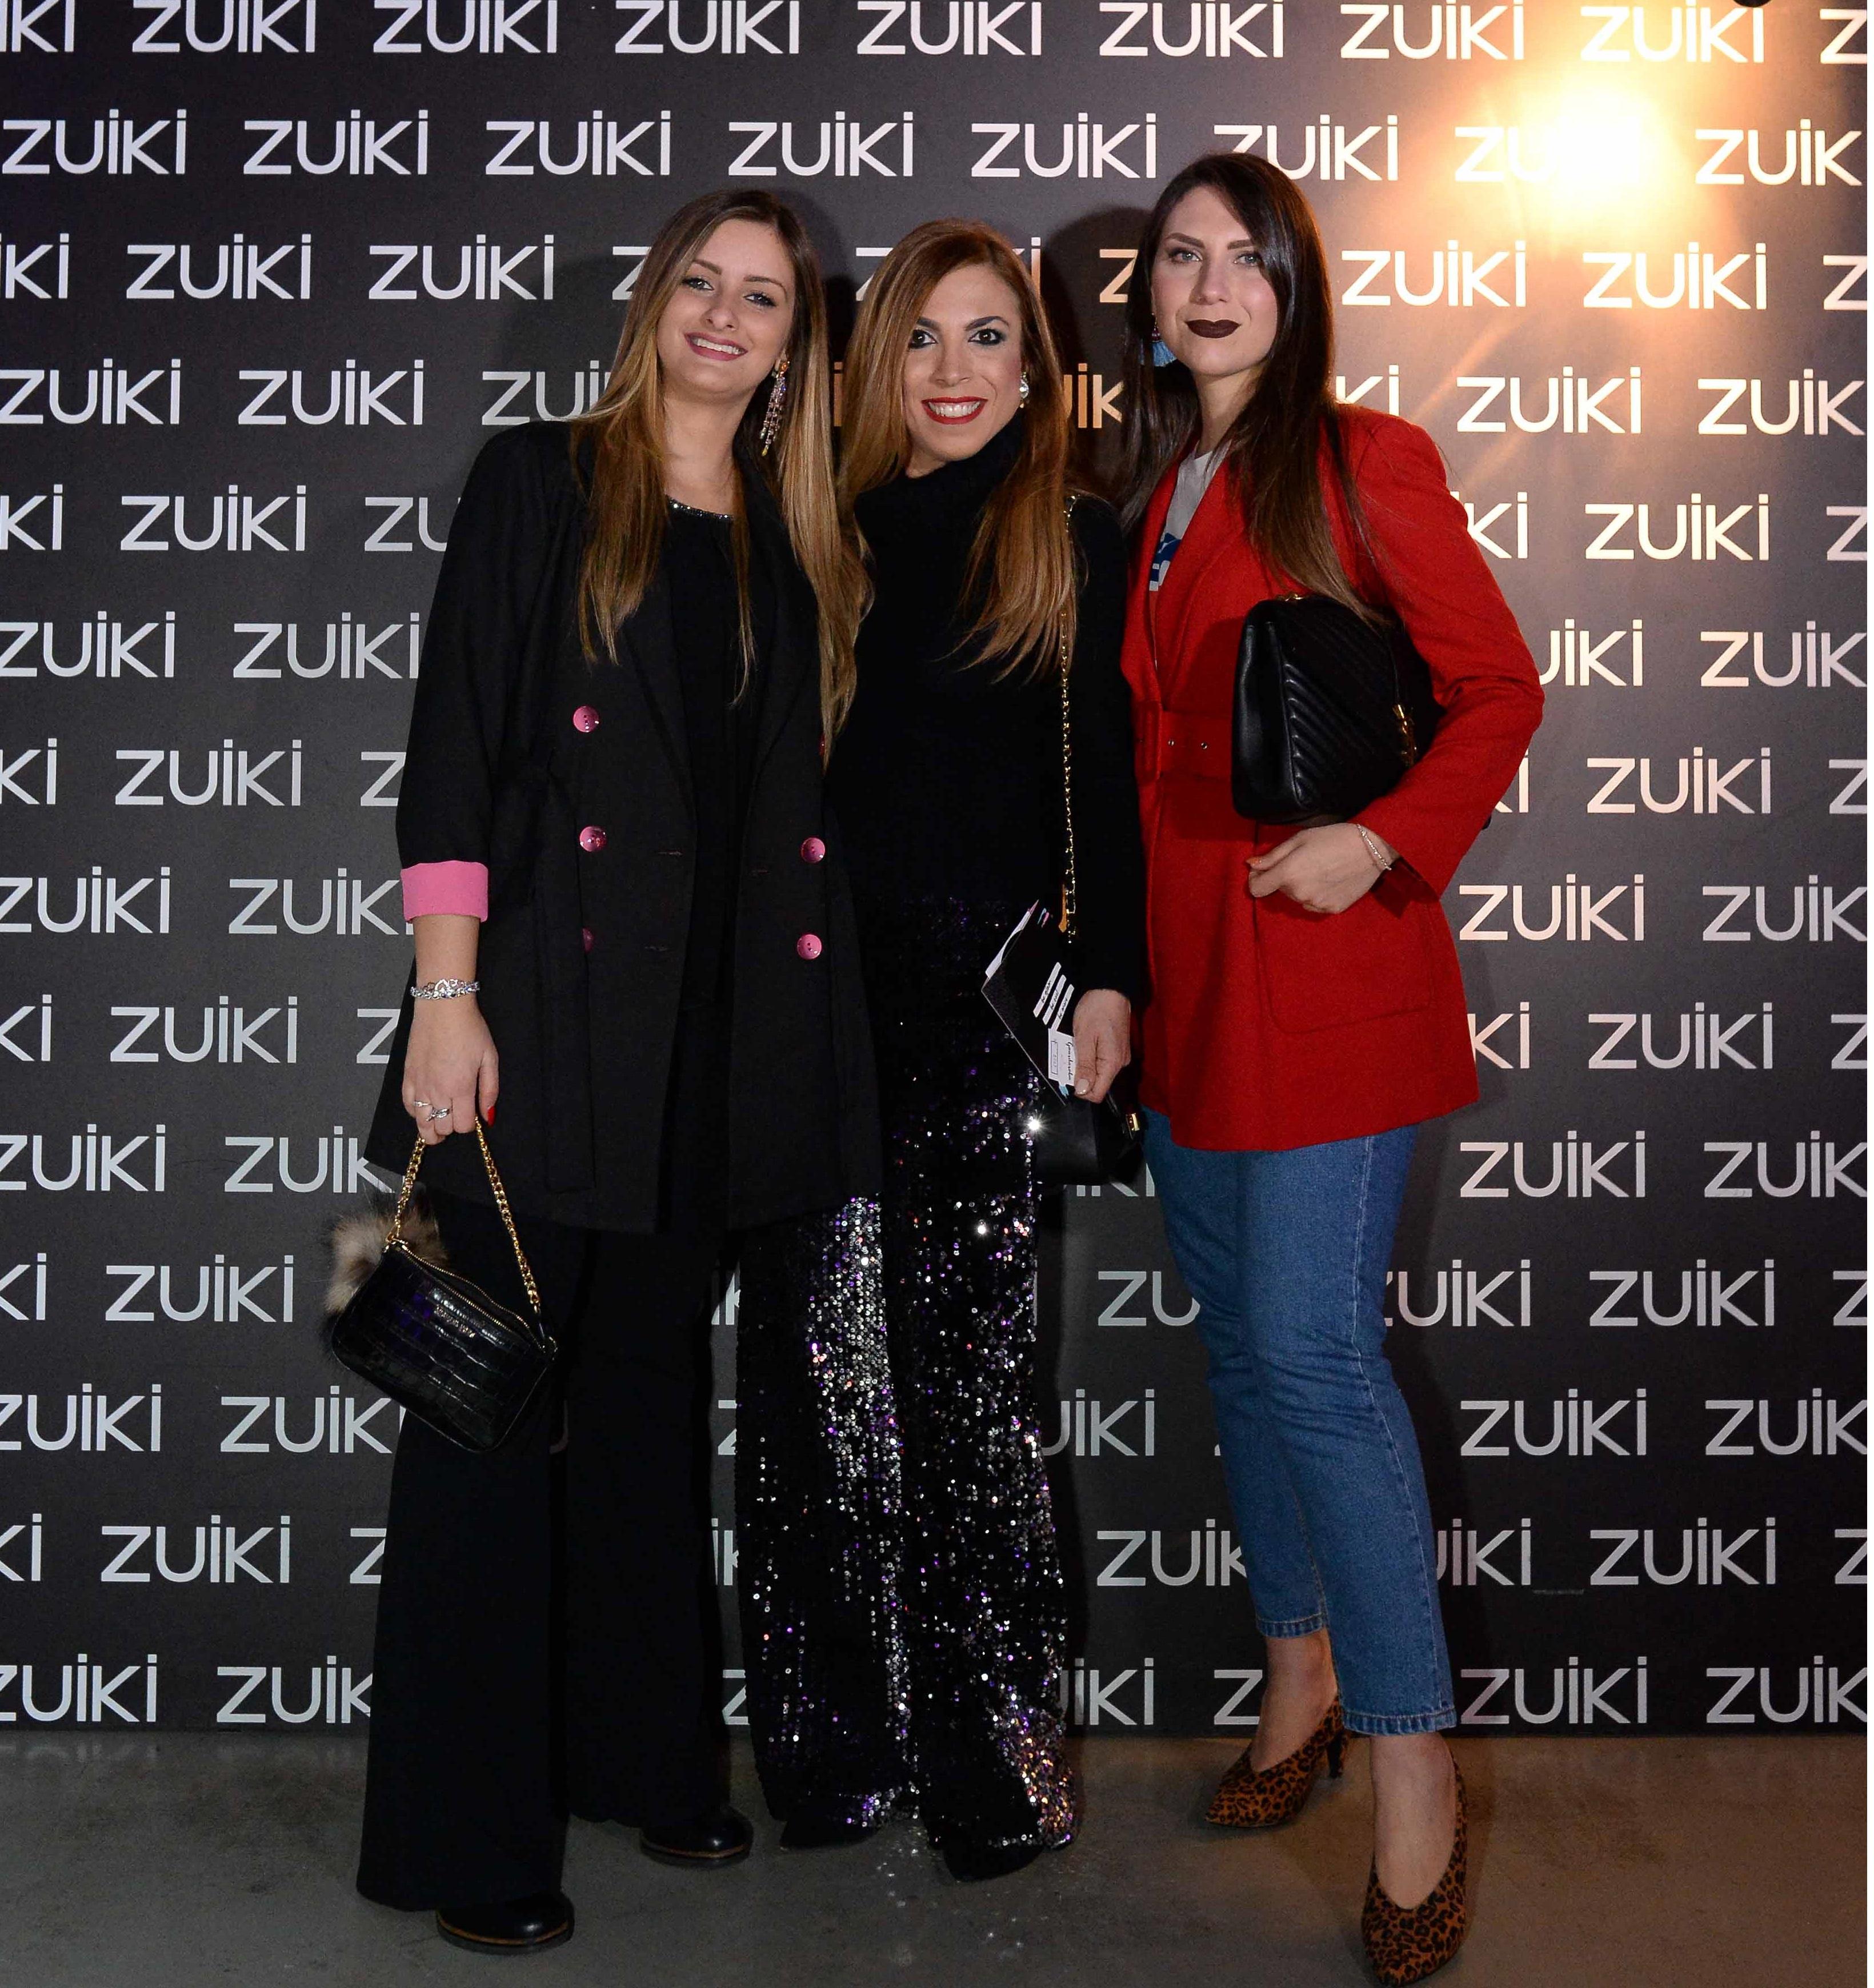 Noemi Guerriero, Annalaura Gaudino e Mariagrazia Ceraso